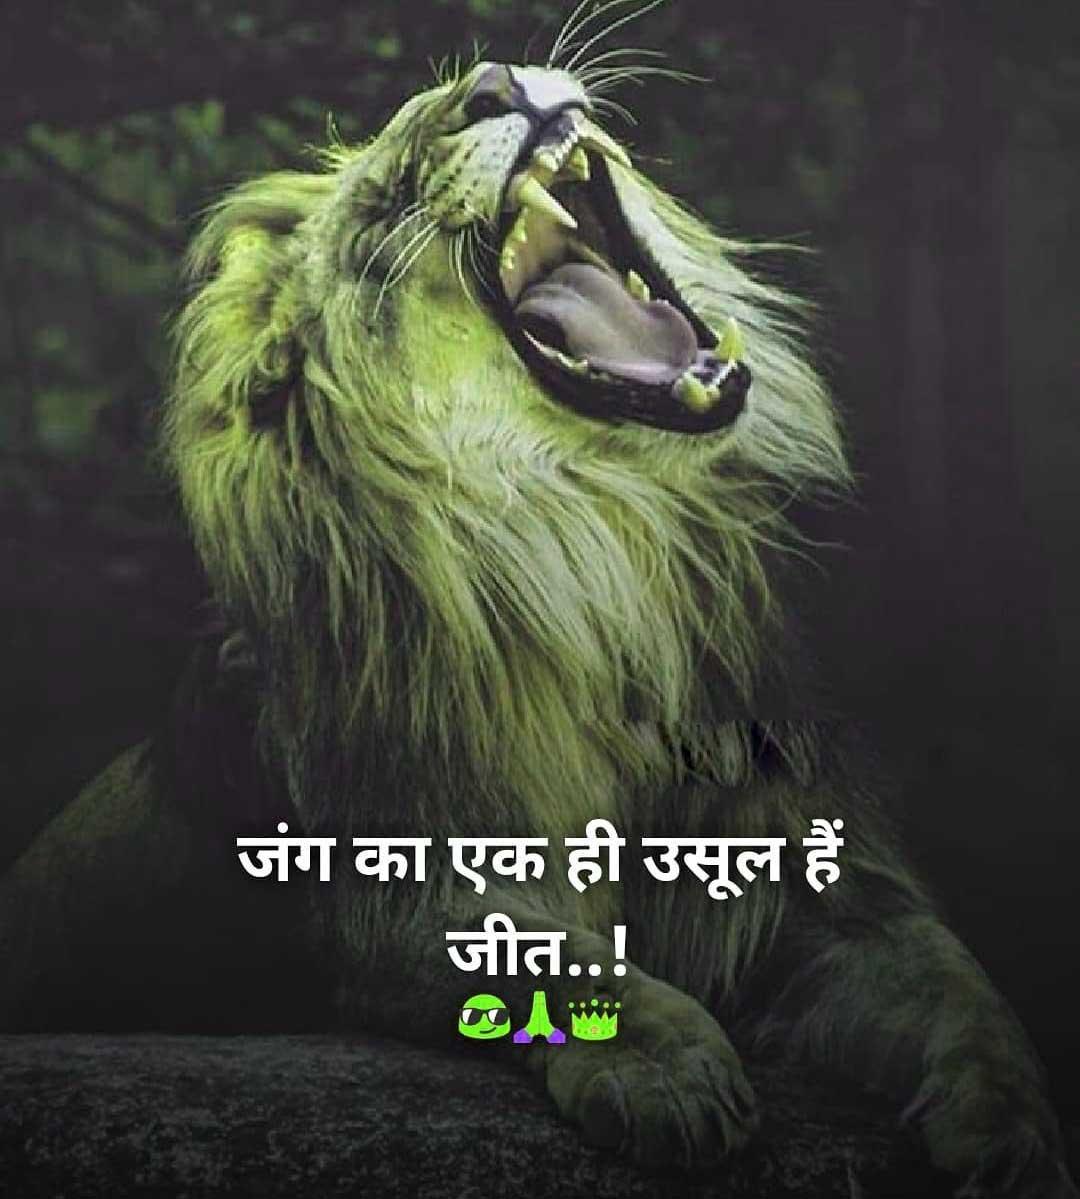 Hindi Attitude Images Photo for Status